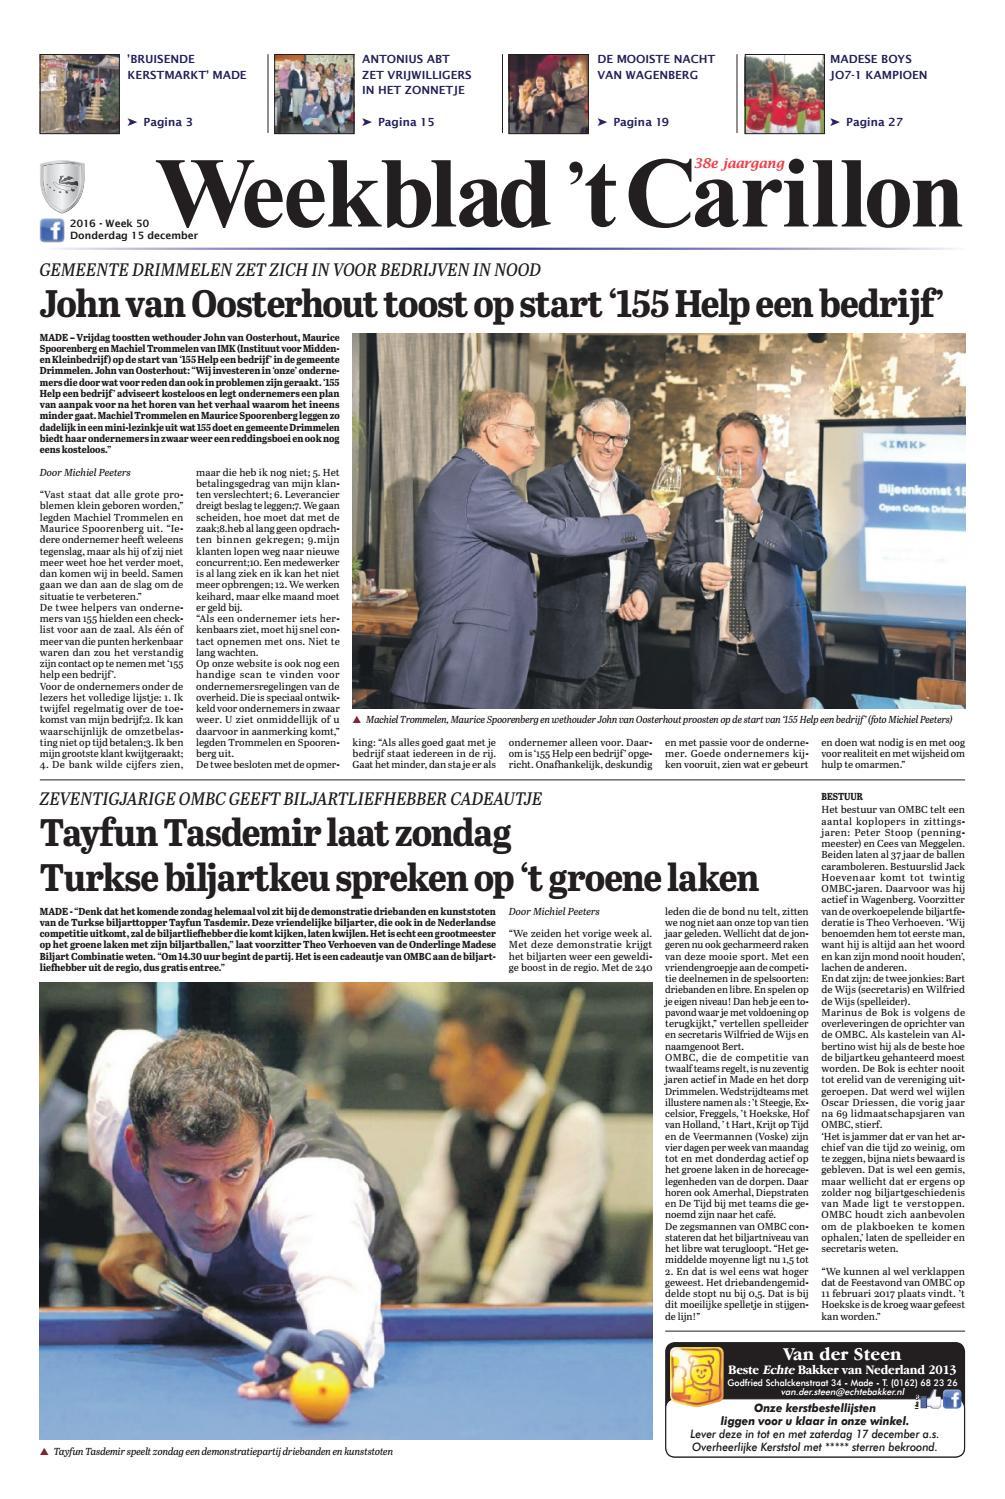 Weekblad 't carillon 21 04 2016 by uitgeverij em de jong   issuu